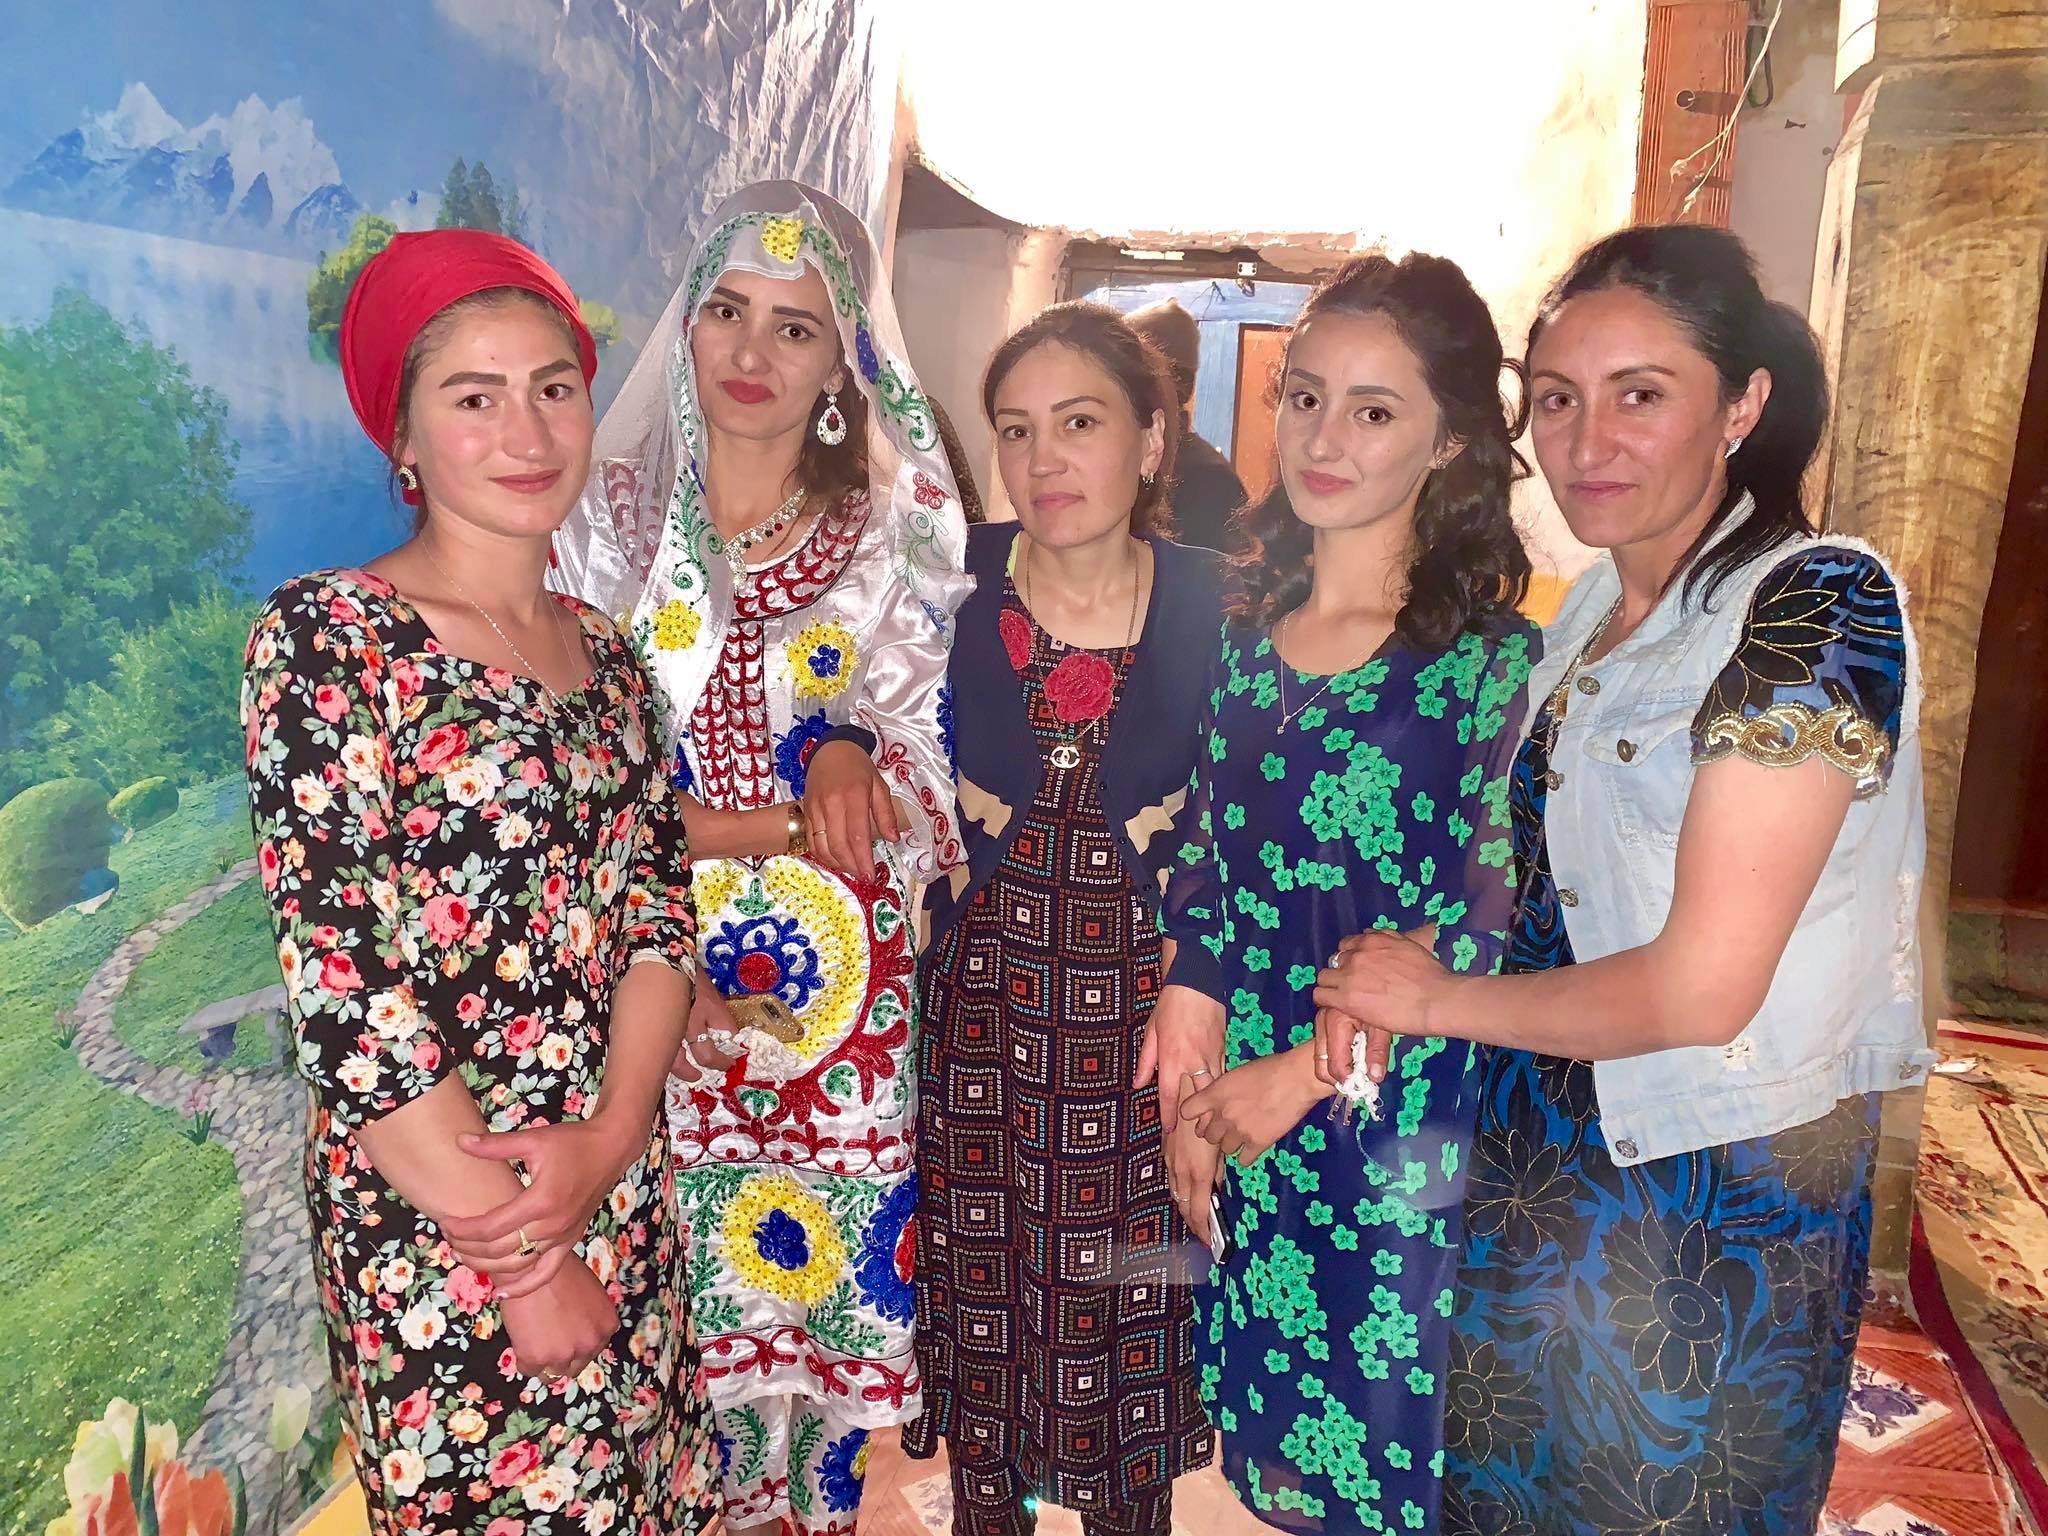 Kach Solo Travels in 2019 Experiencing a Traditional Wakhan Wedding in Tajikistan9.jpg